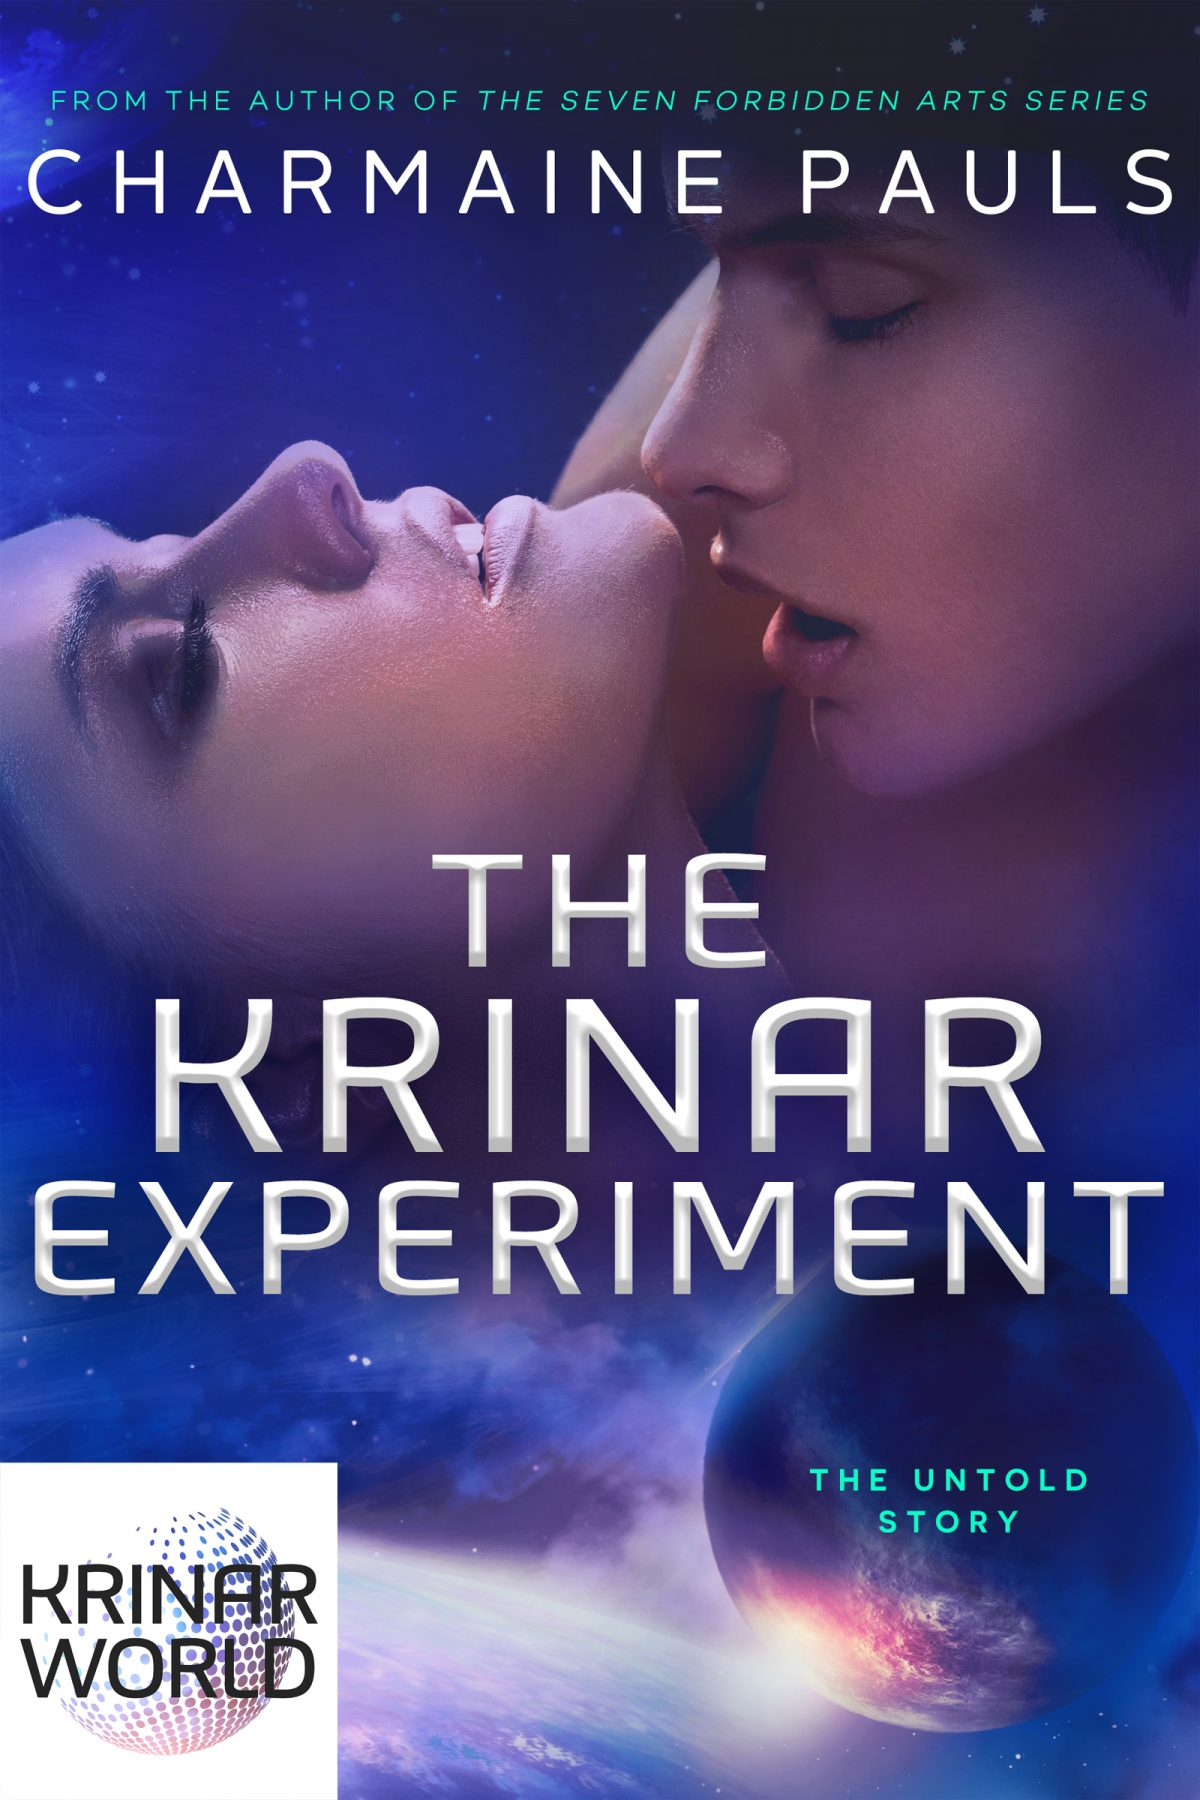 The Krinar Experiment